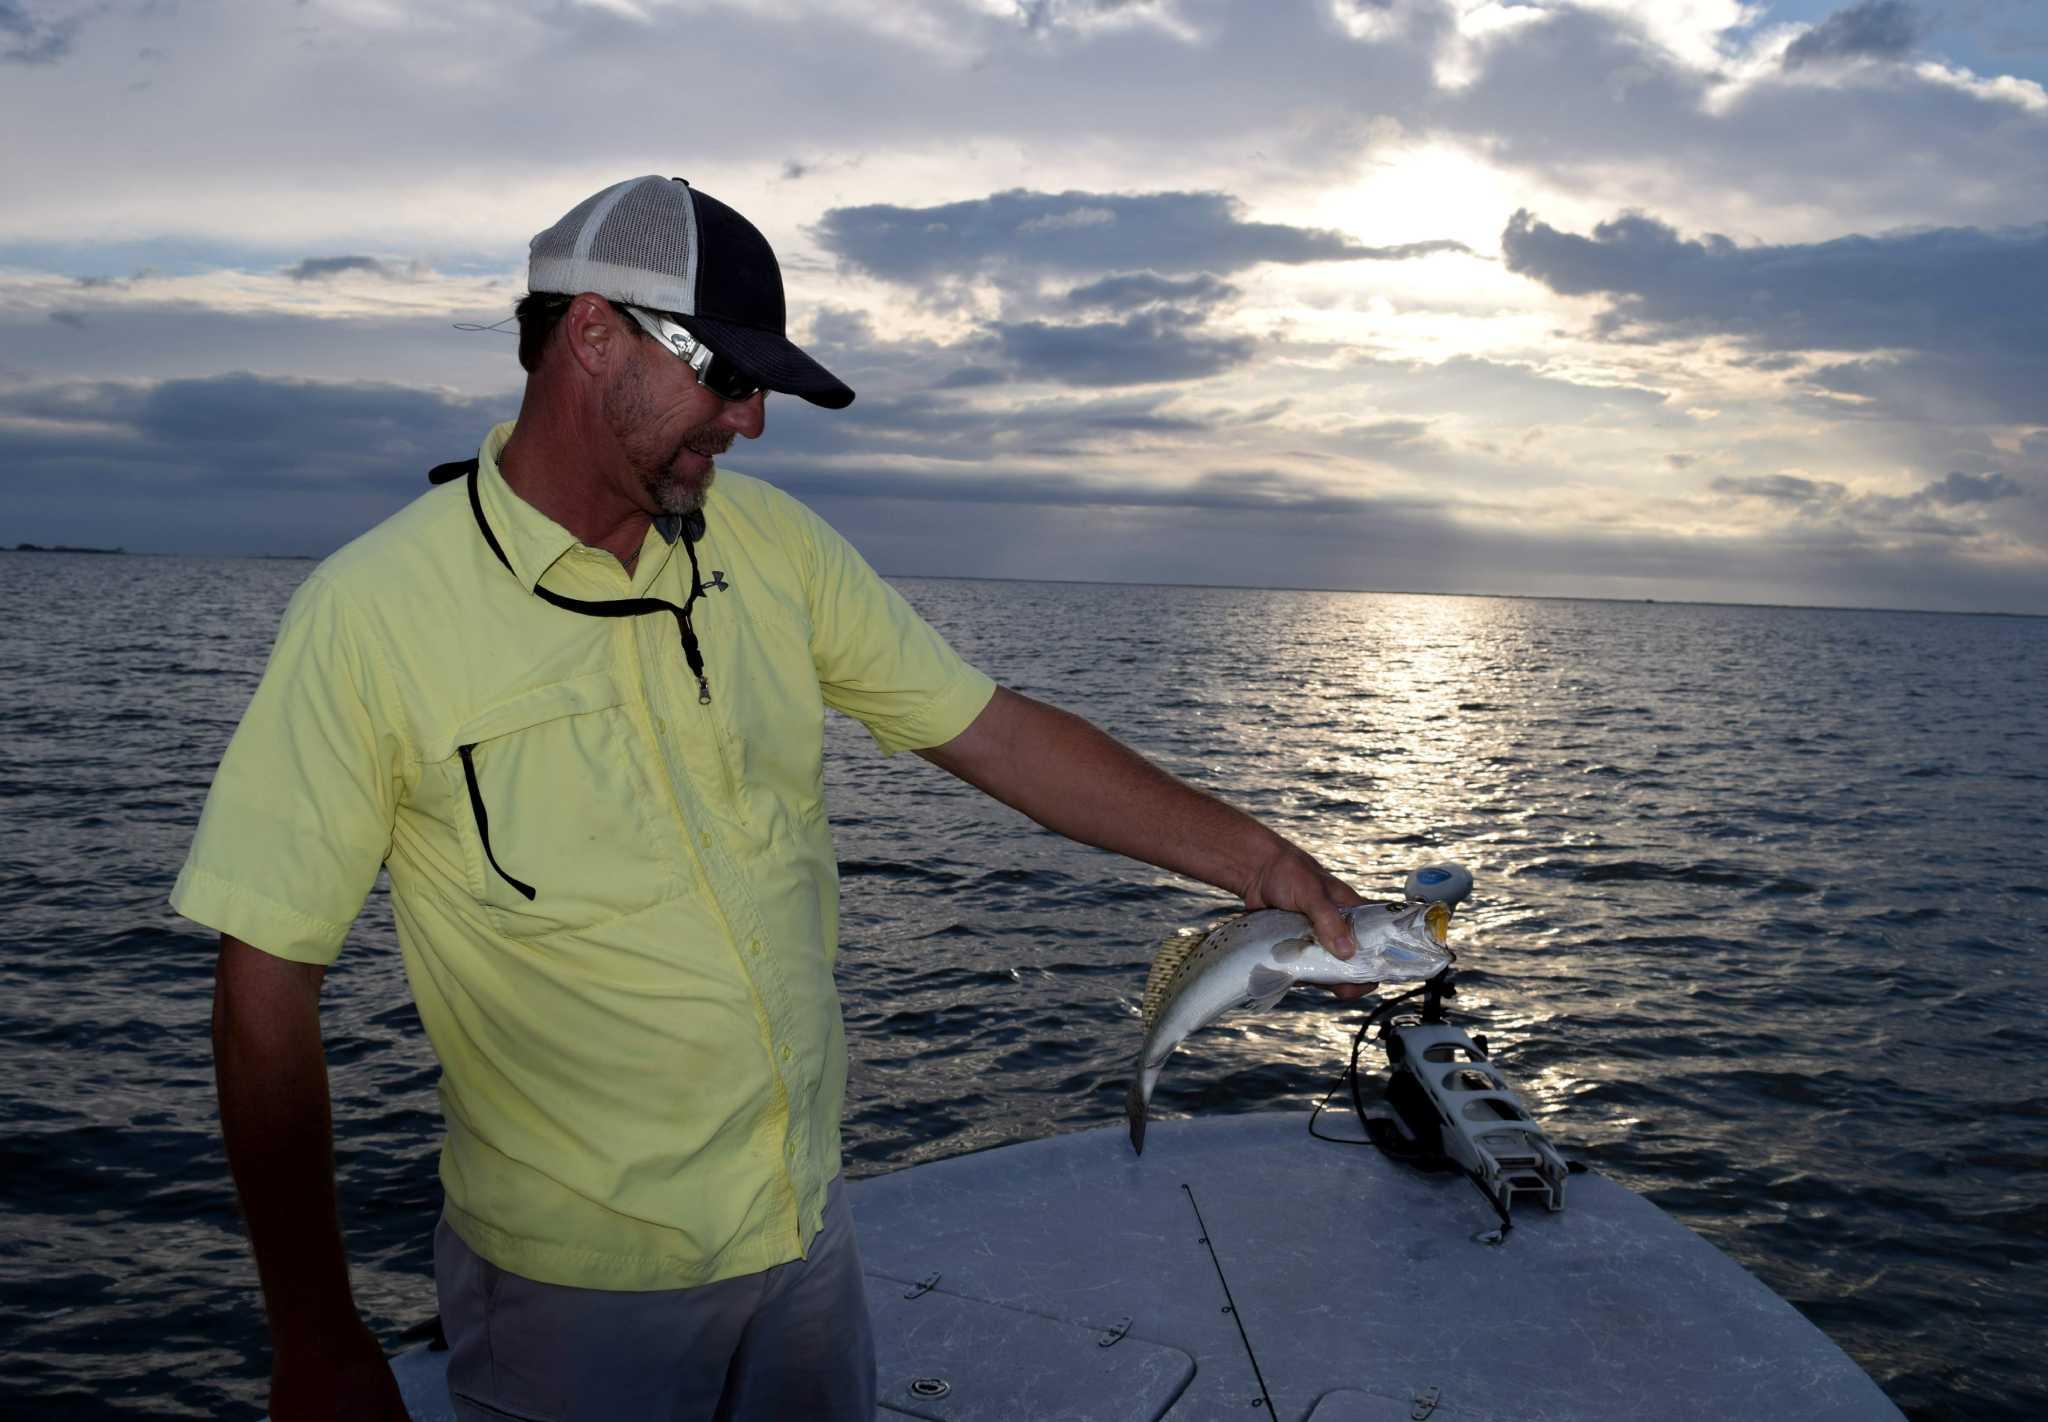 Elements don t deter baffin bay fishing guide san for Fishing near san antonio